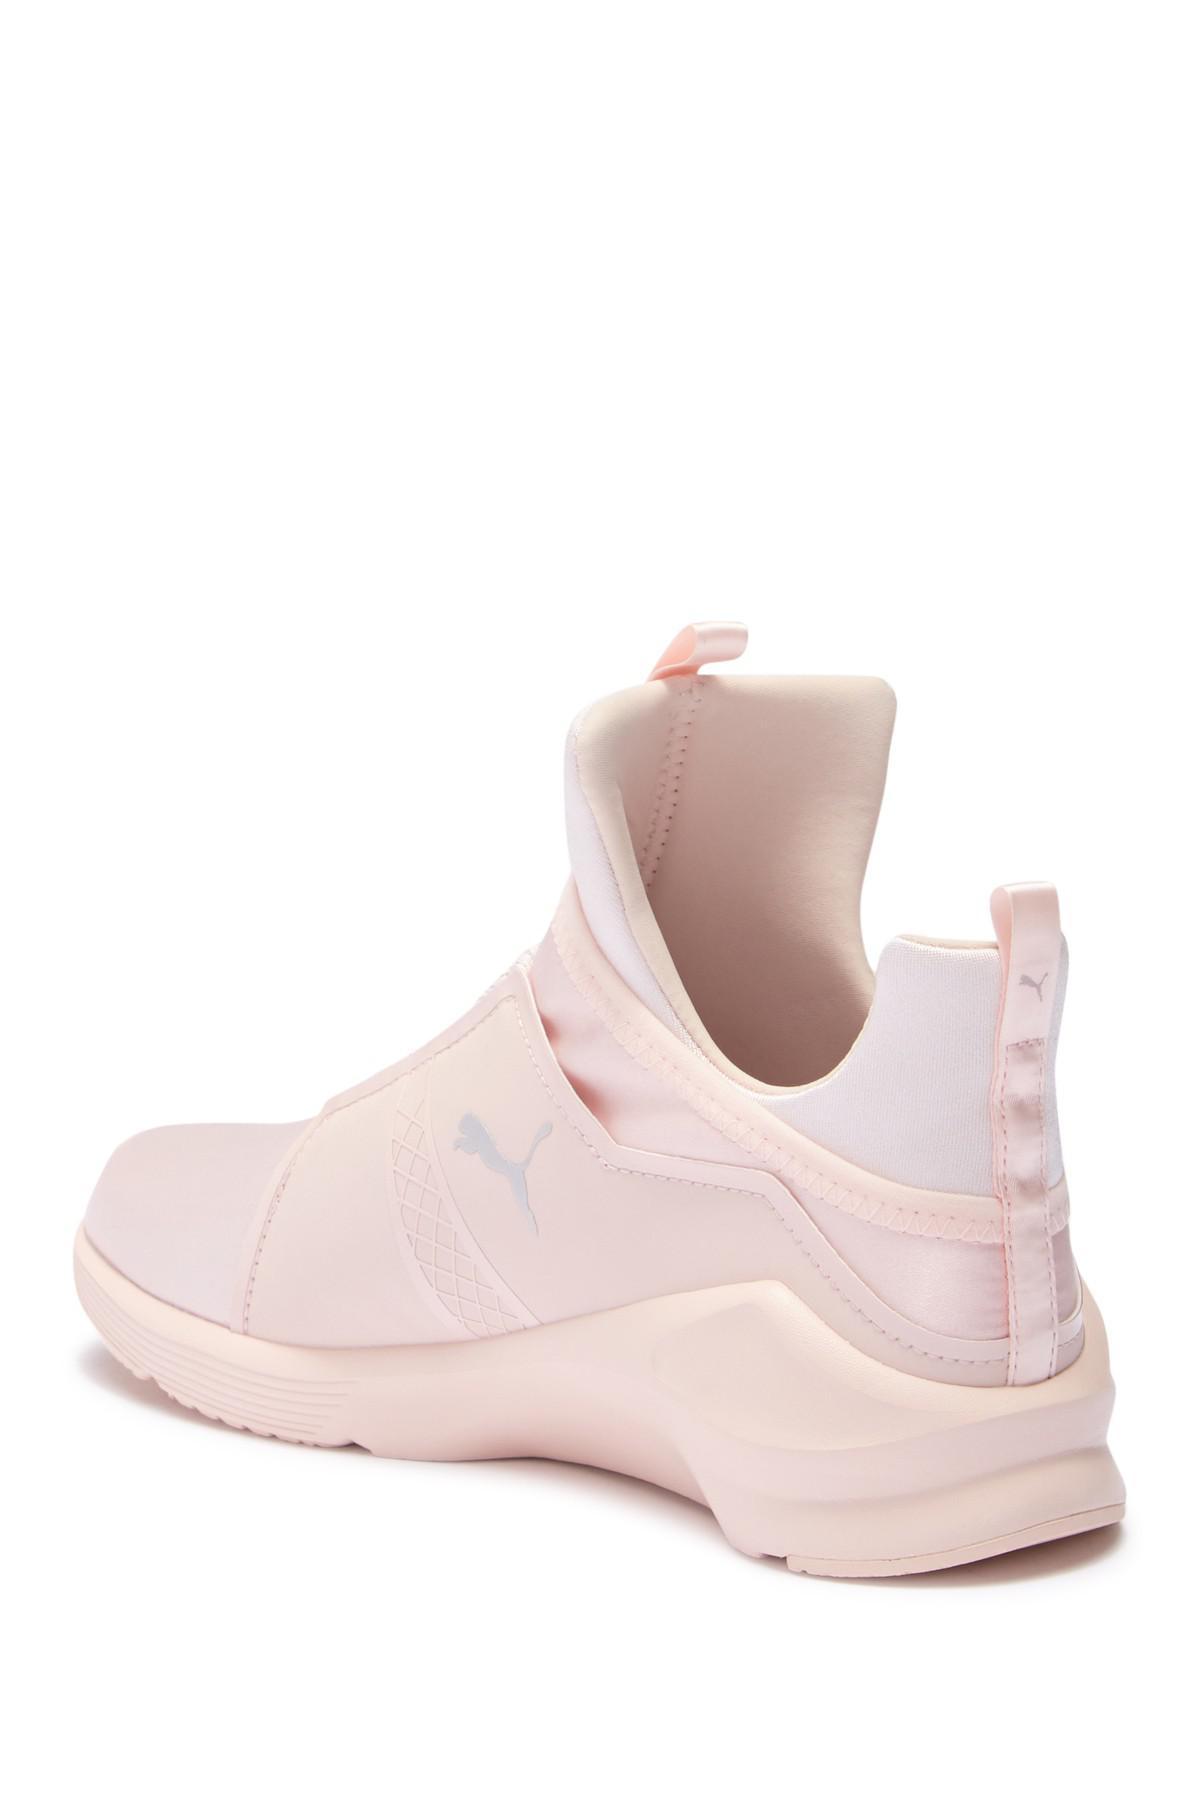 PUMA - White Fierce Satin Ep Training Sneaker - Lyst. View fullscreen 61e194bb2